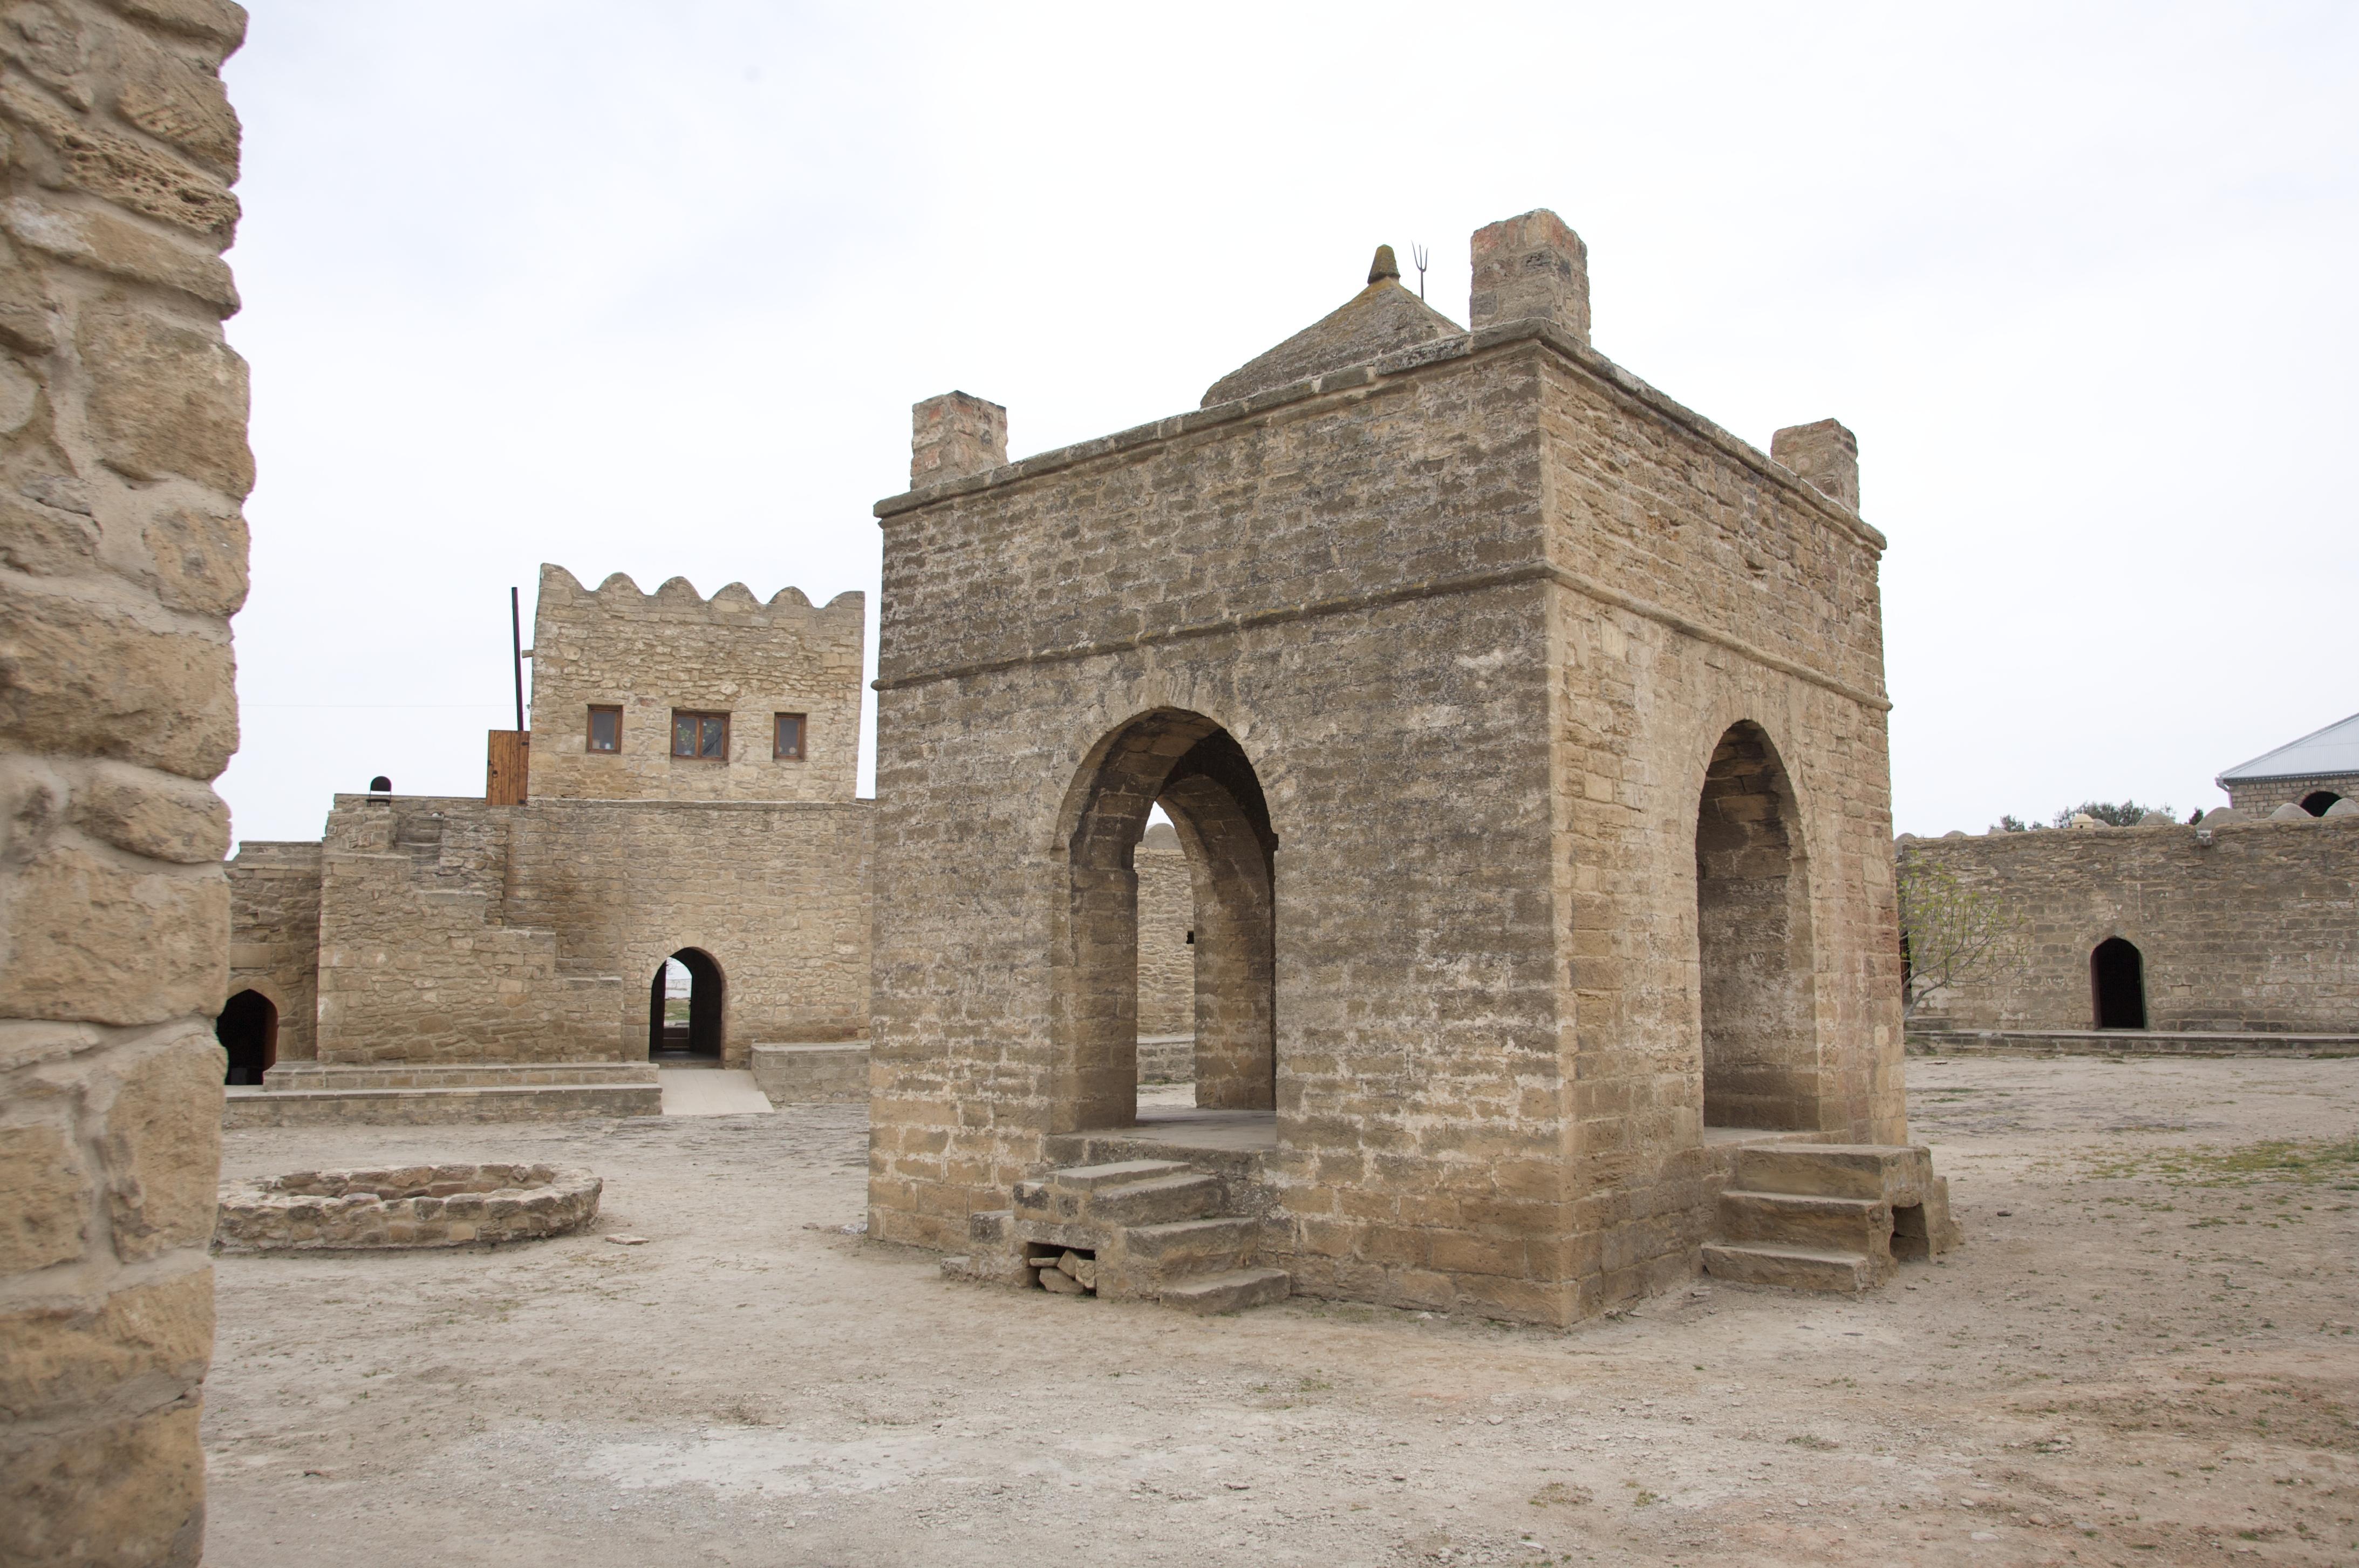 Fichier:Ateshgah Fire Temple.jpg — Wikipédia